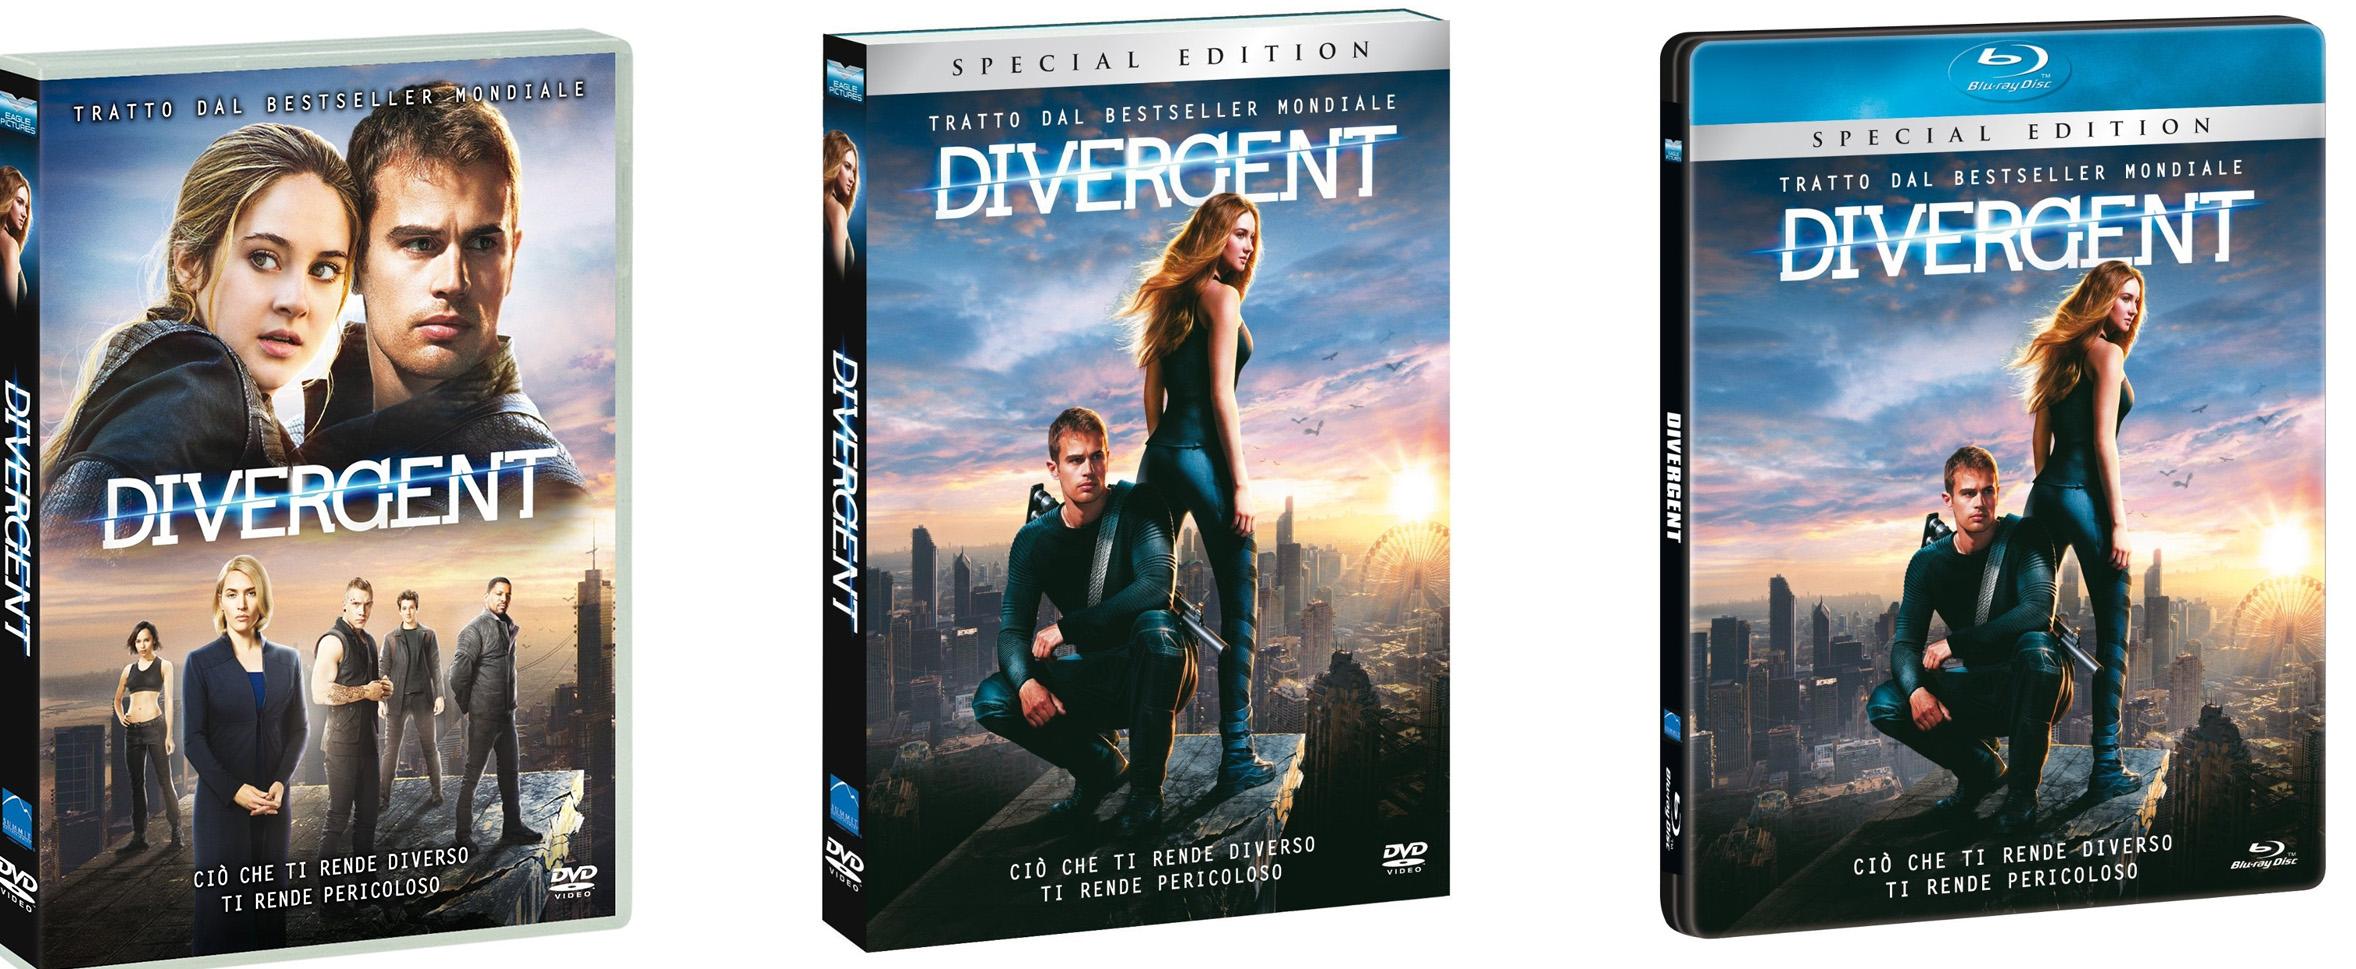 Le cover homevideo di Divergent